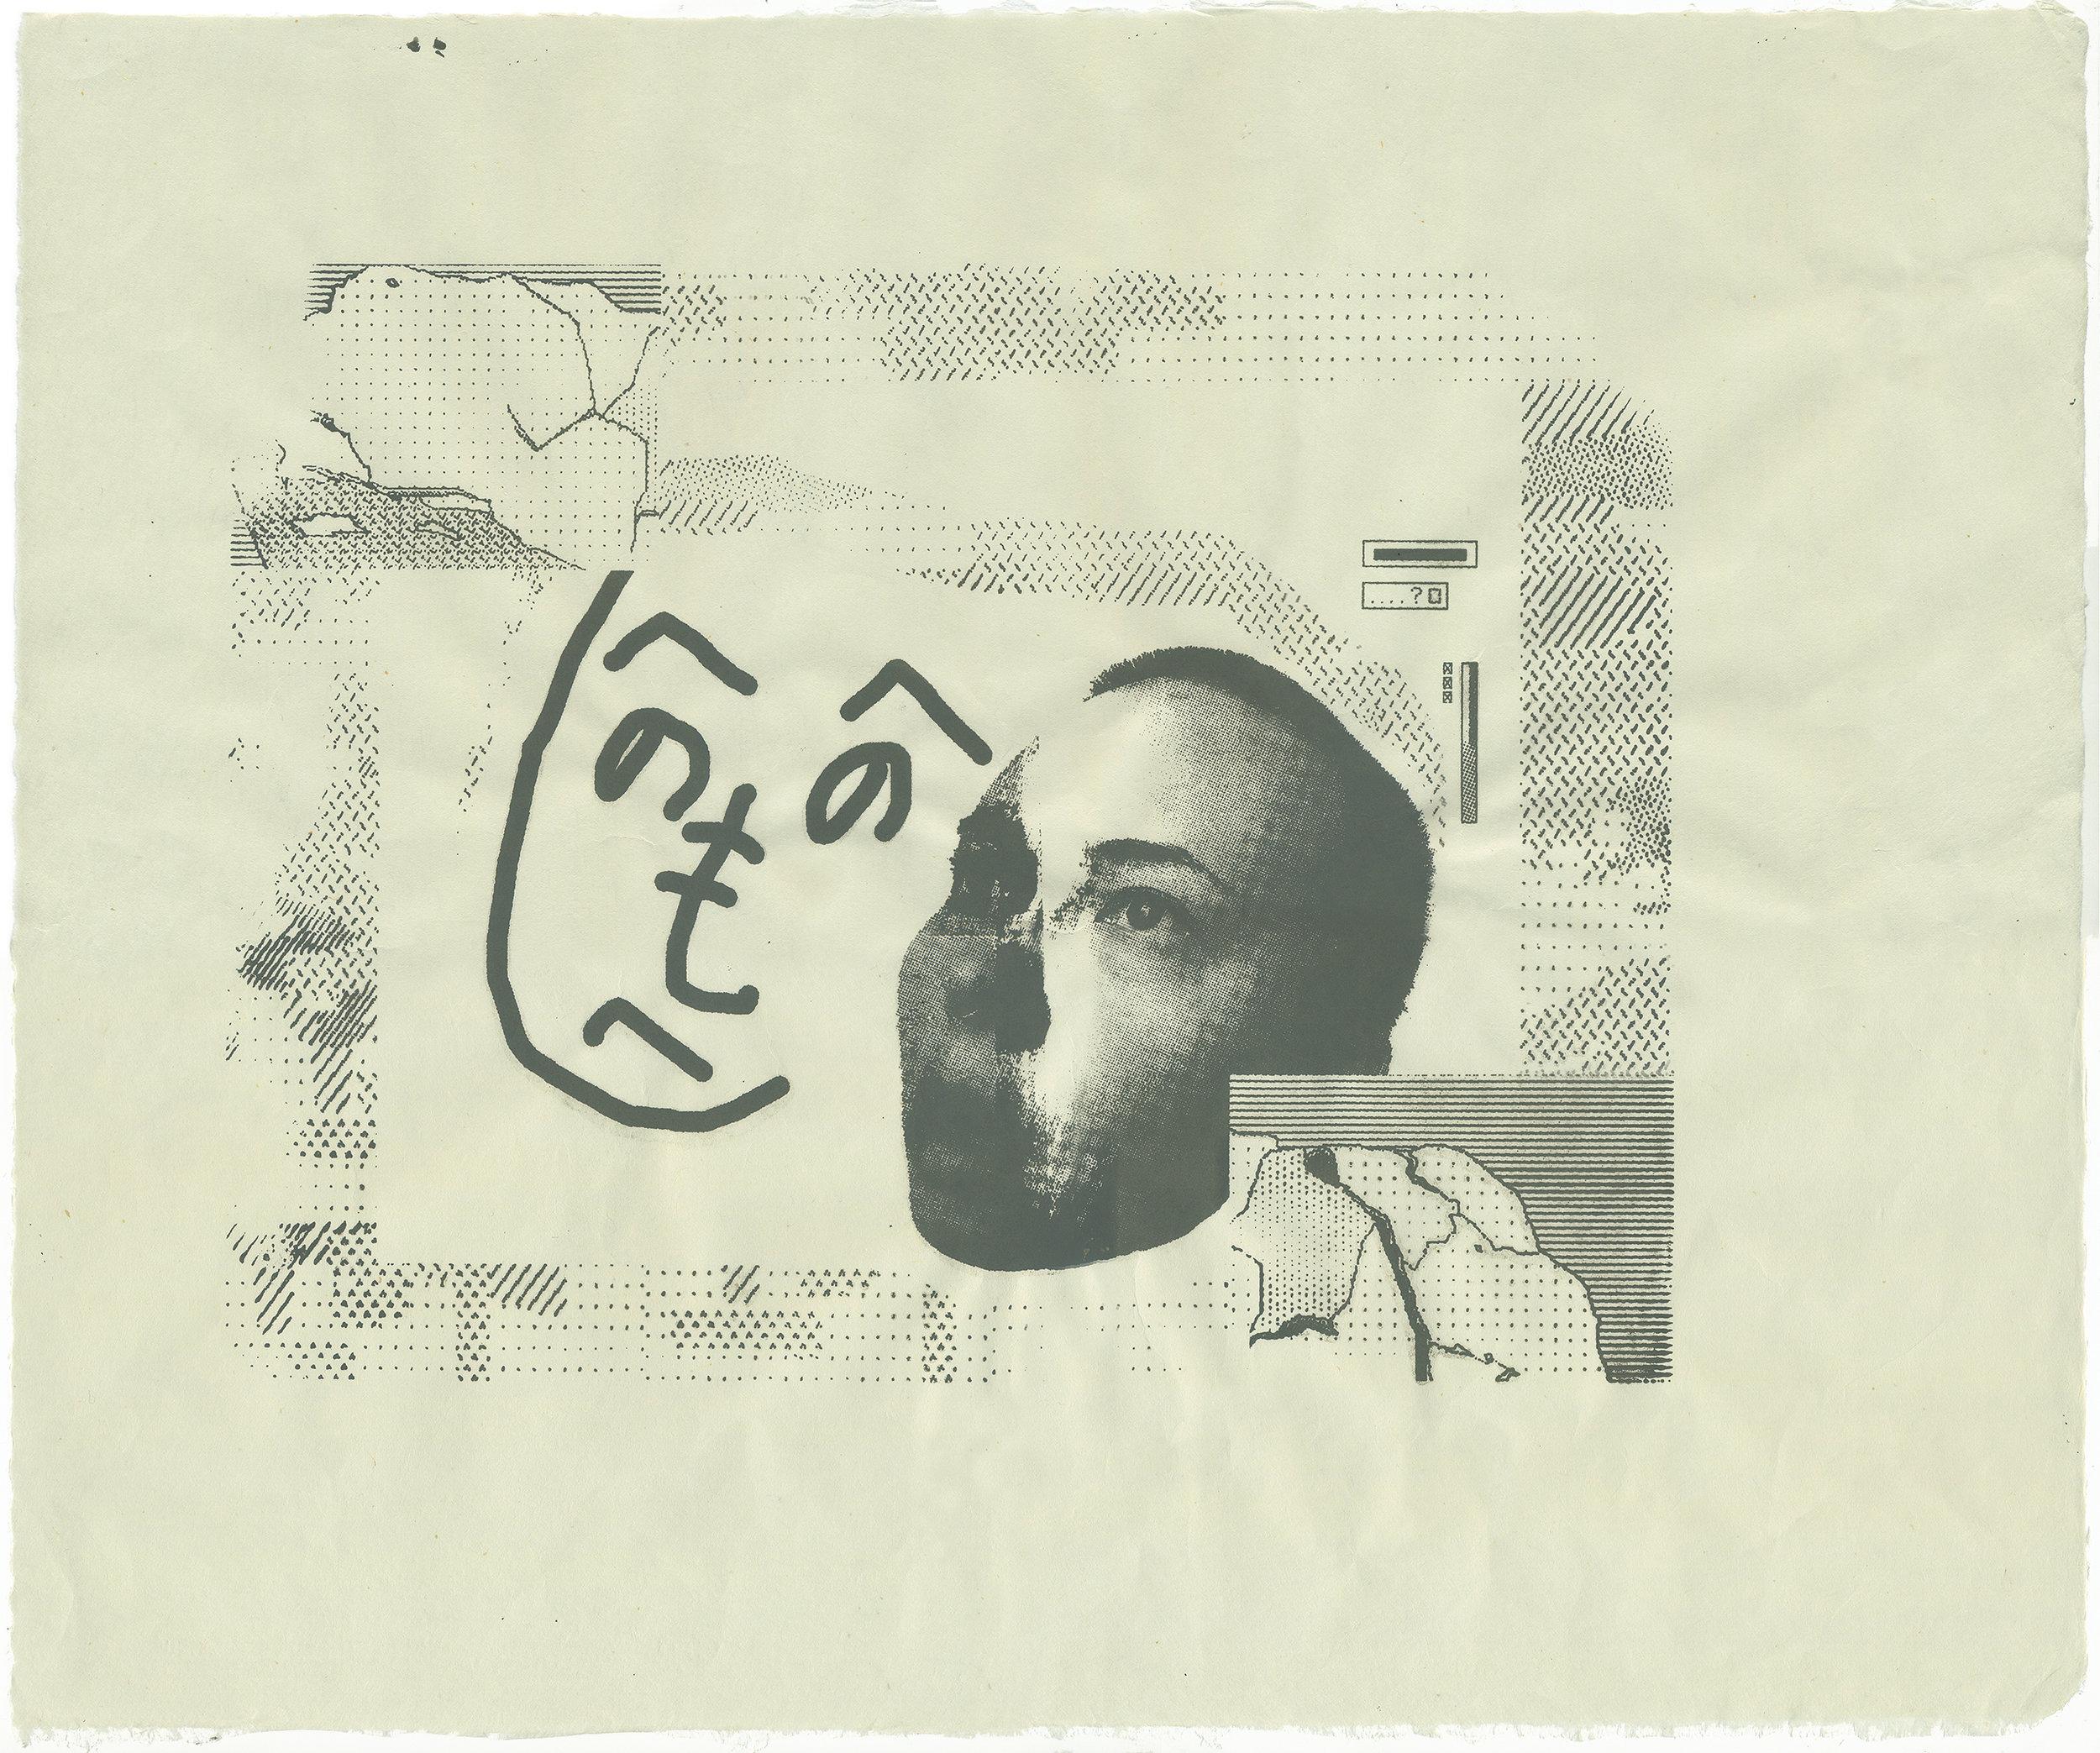 HenoHenoMoHeji  silkscreen print on kitakata 20.5 x 17 in. 2018 Edition of 2